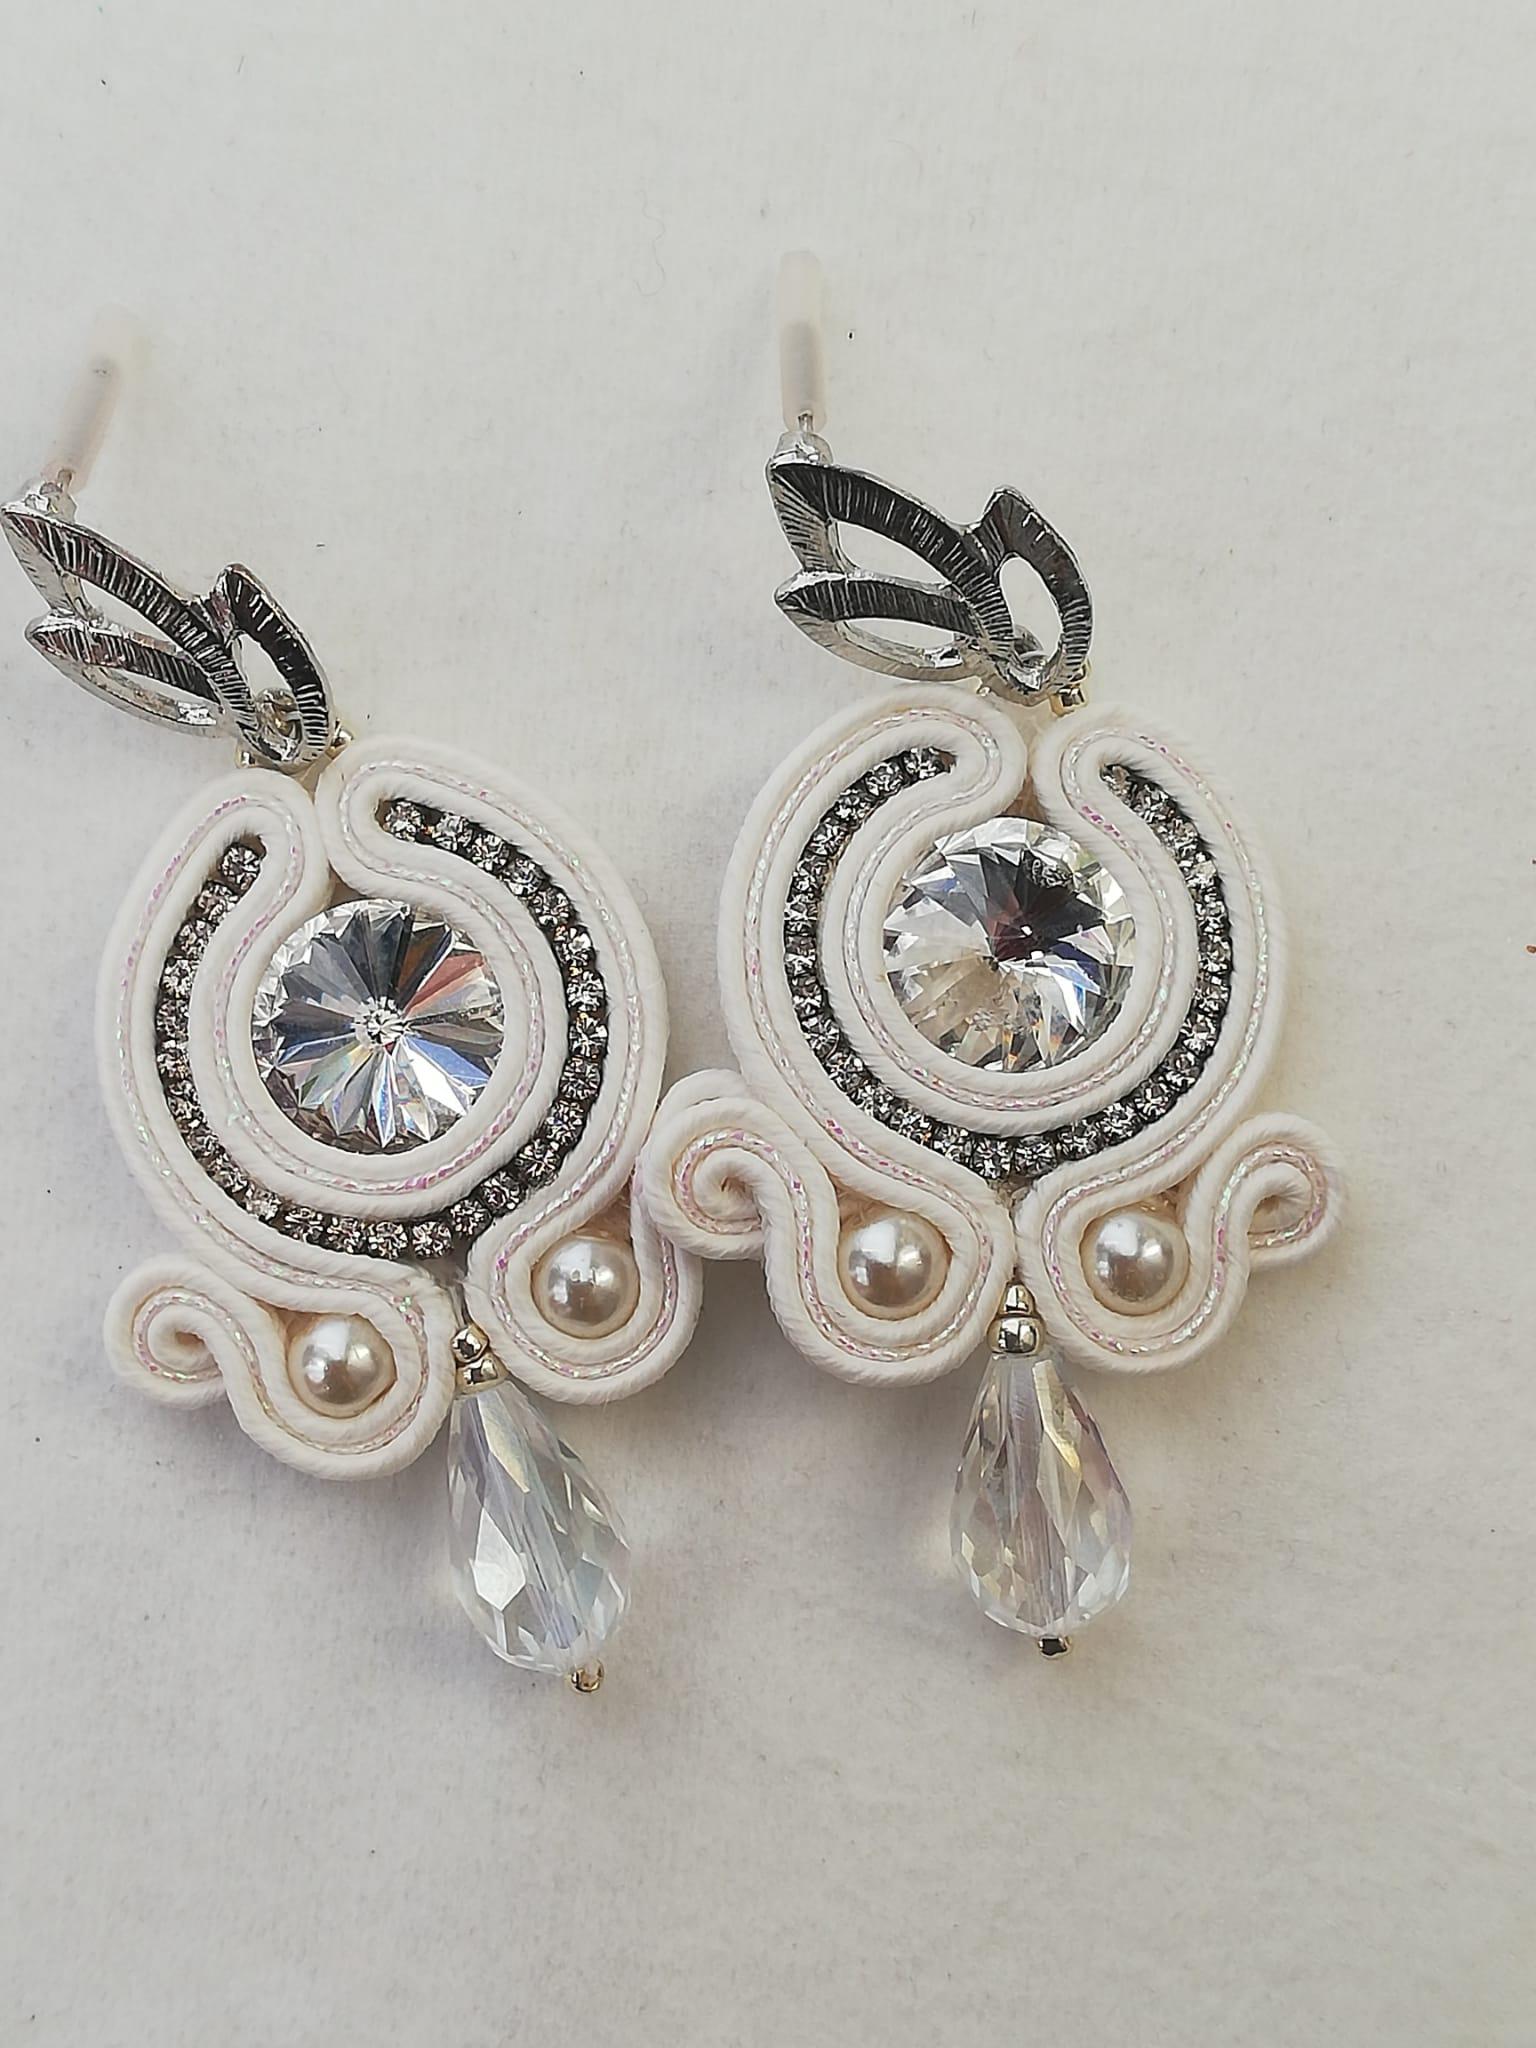 Beautiful handmade soutache earrings